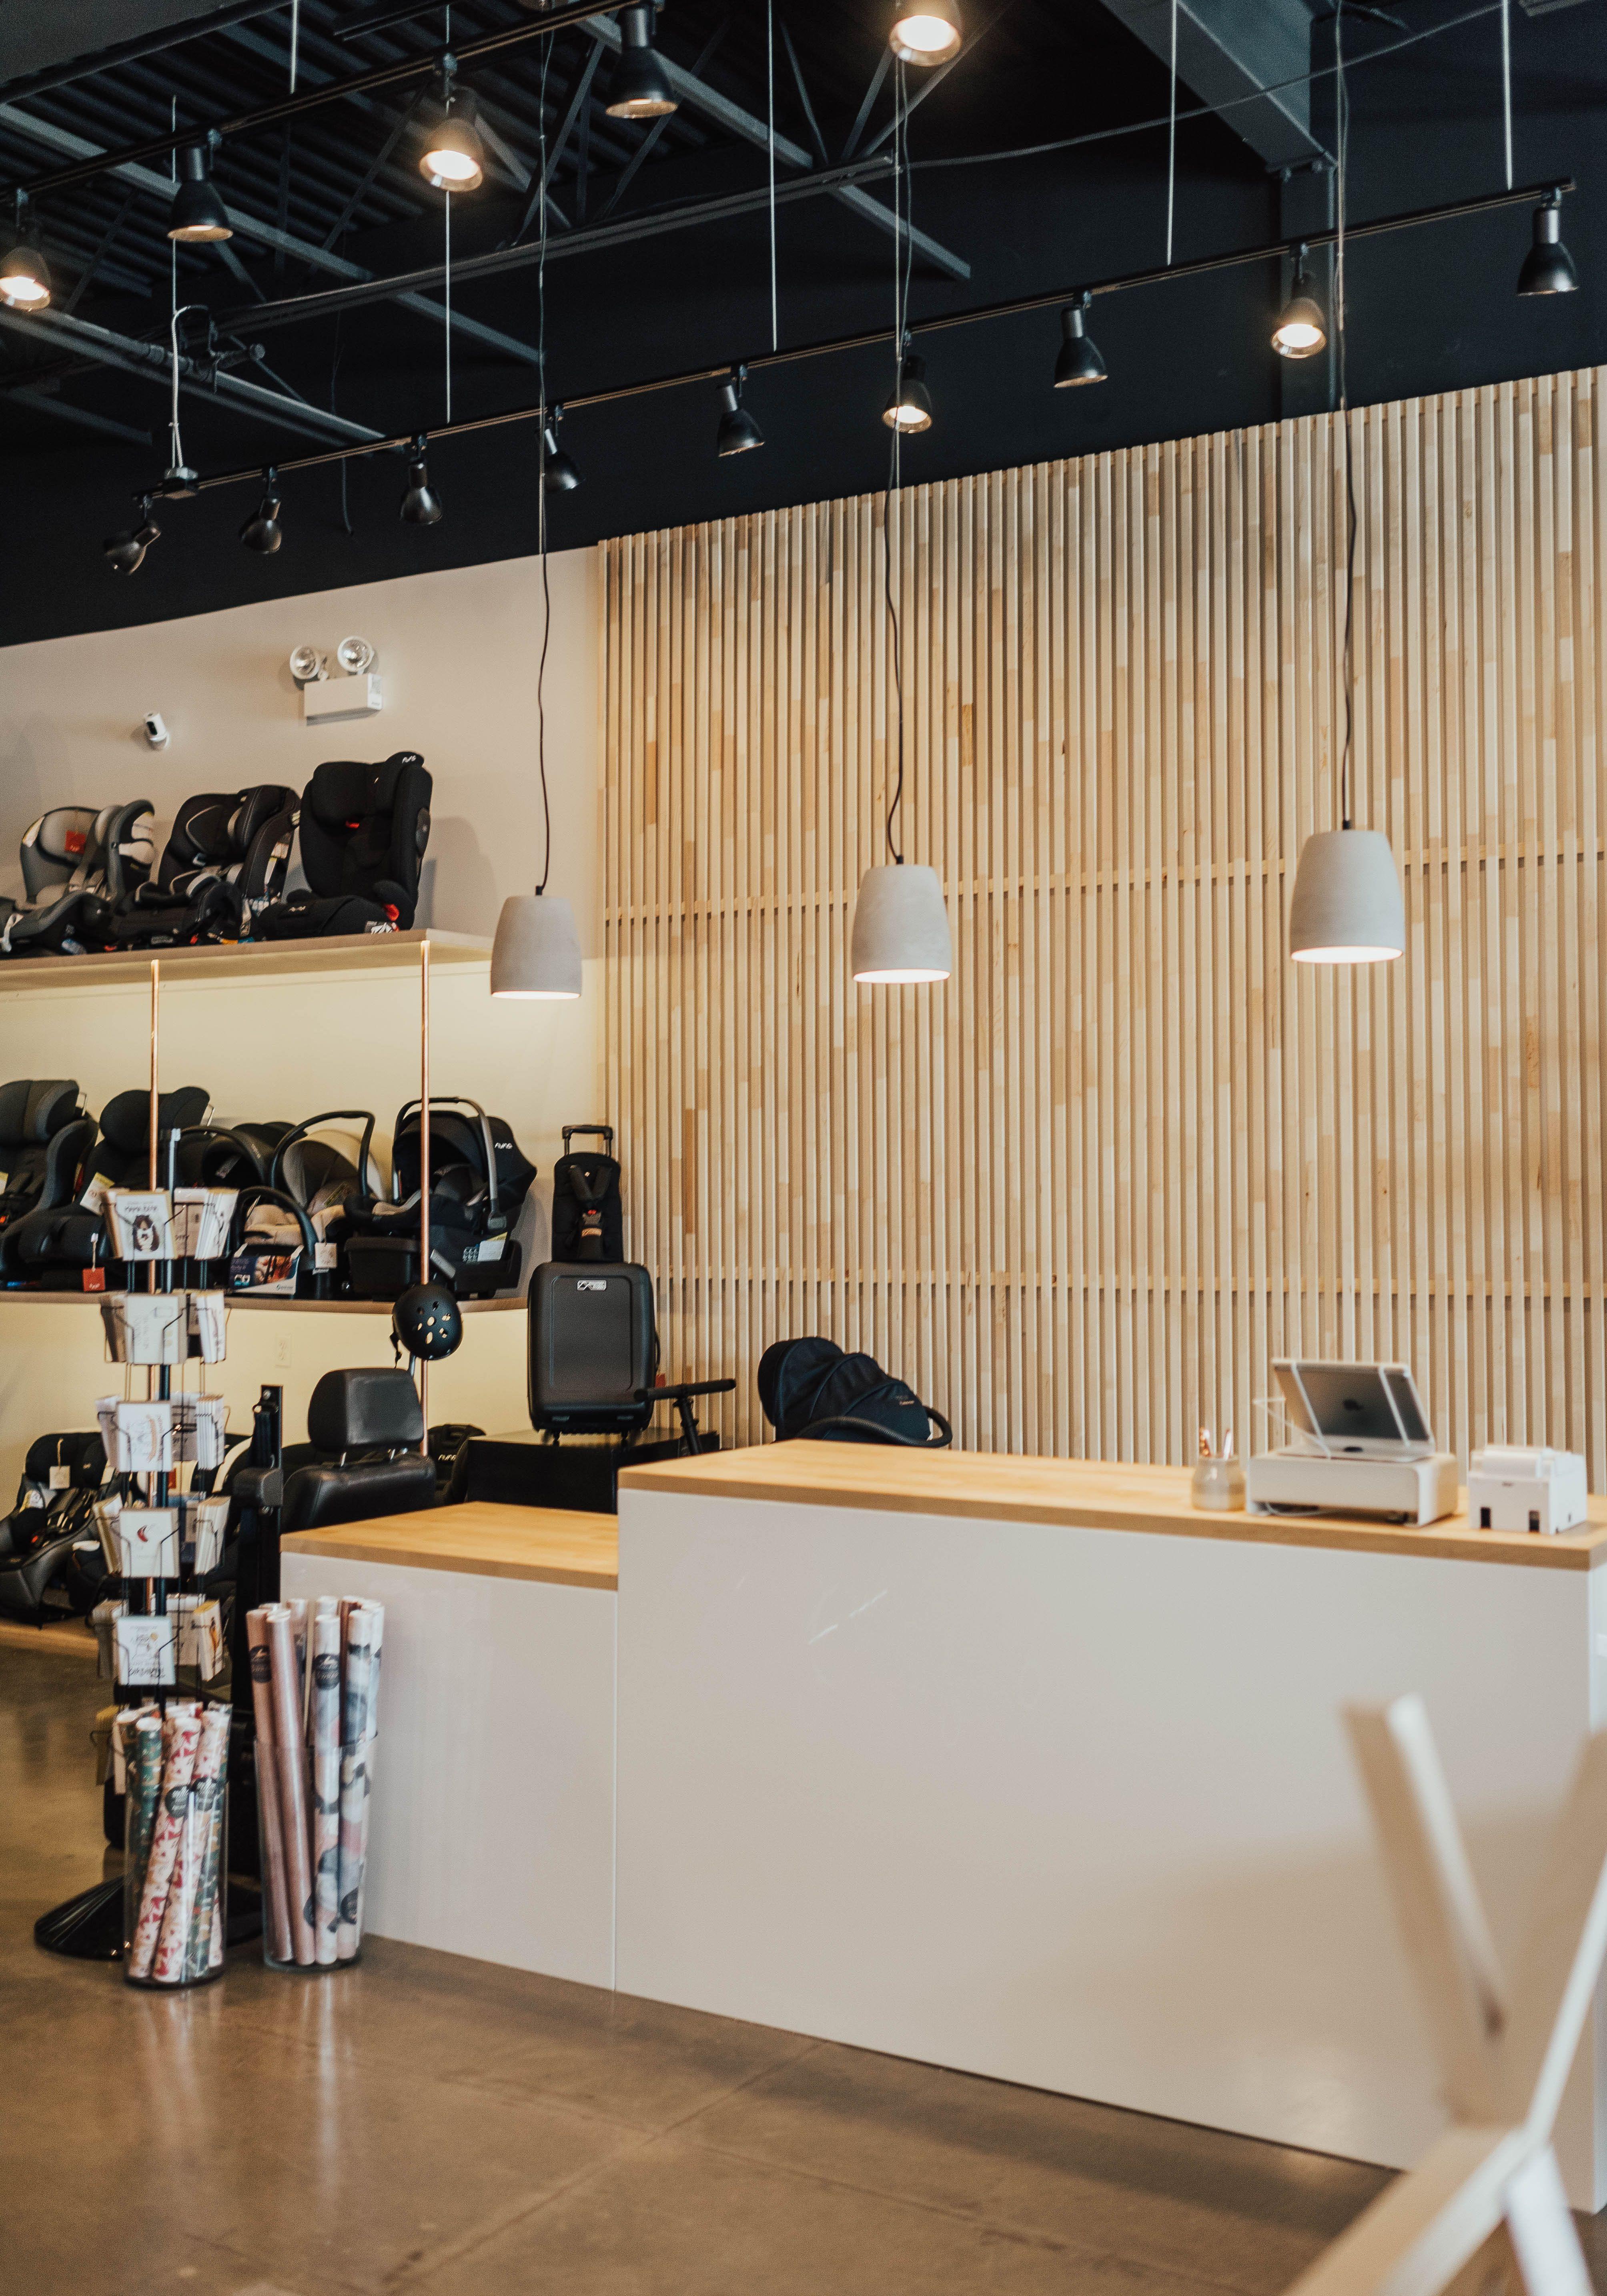 Stroller Haus Retail Store Design | Retail store design ...